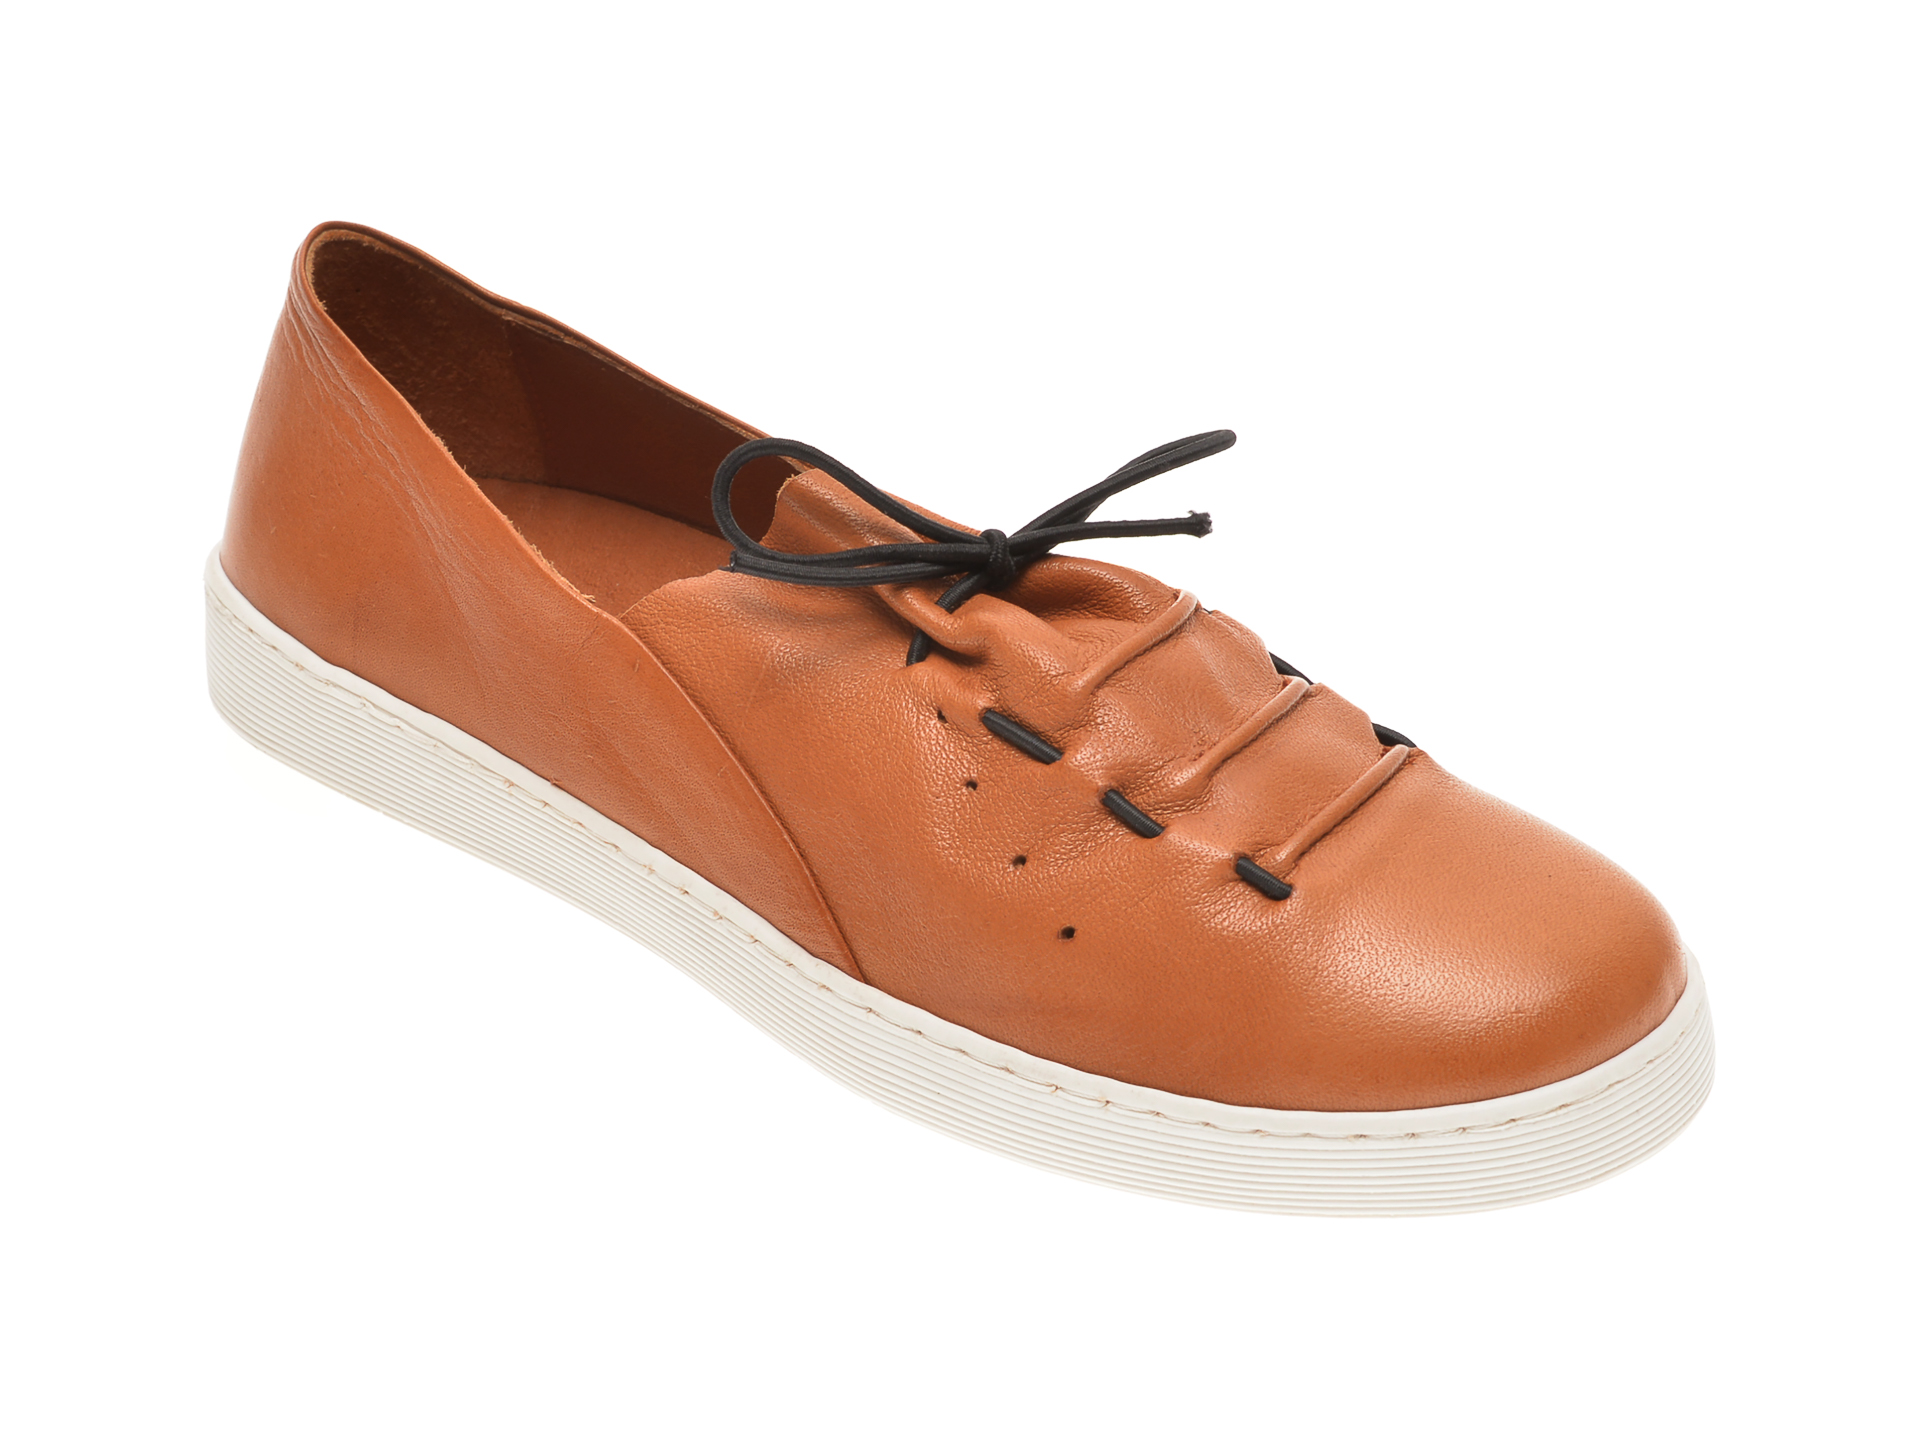 Pantofi BABOOS maro, R09, din piele naturala